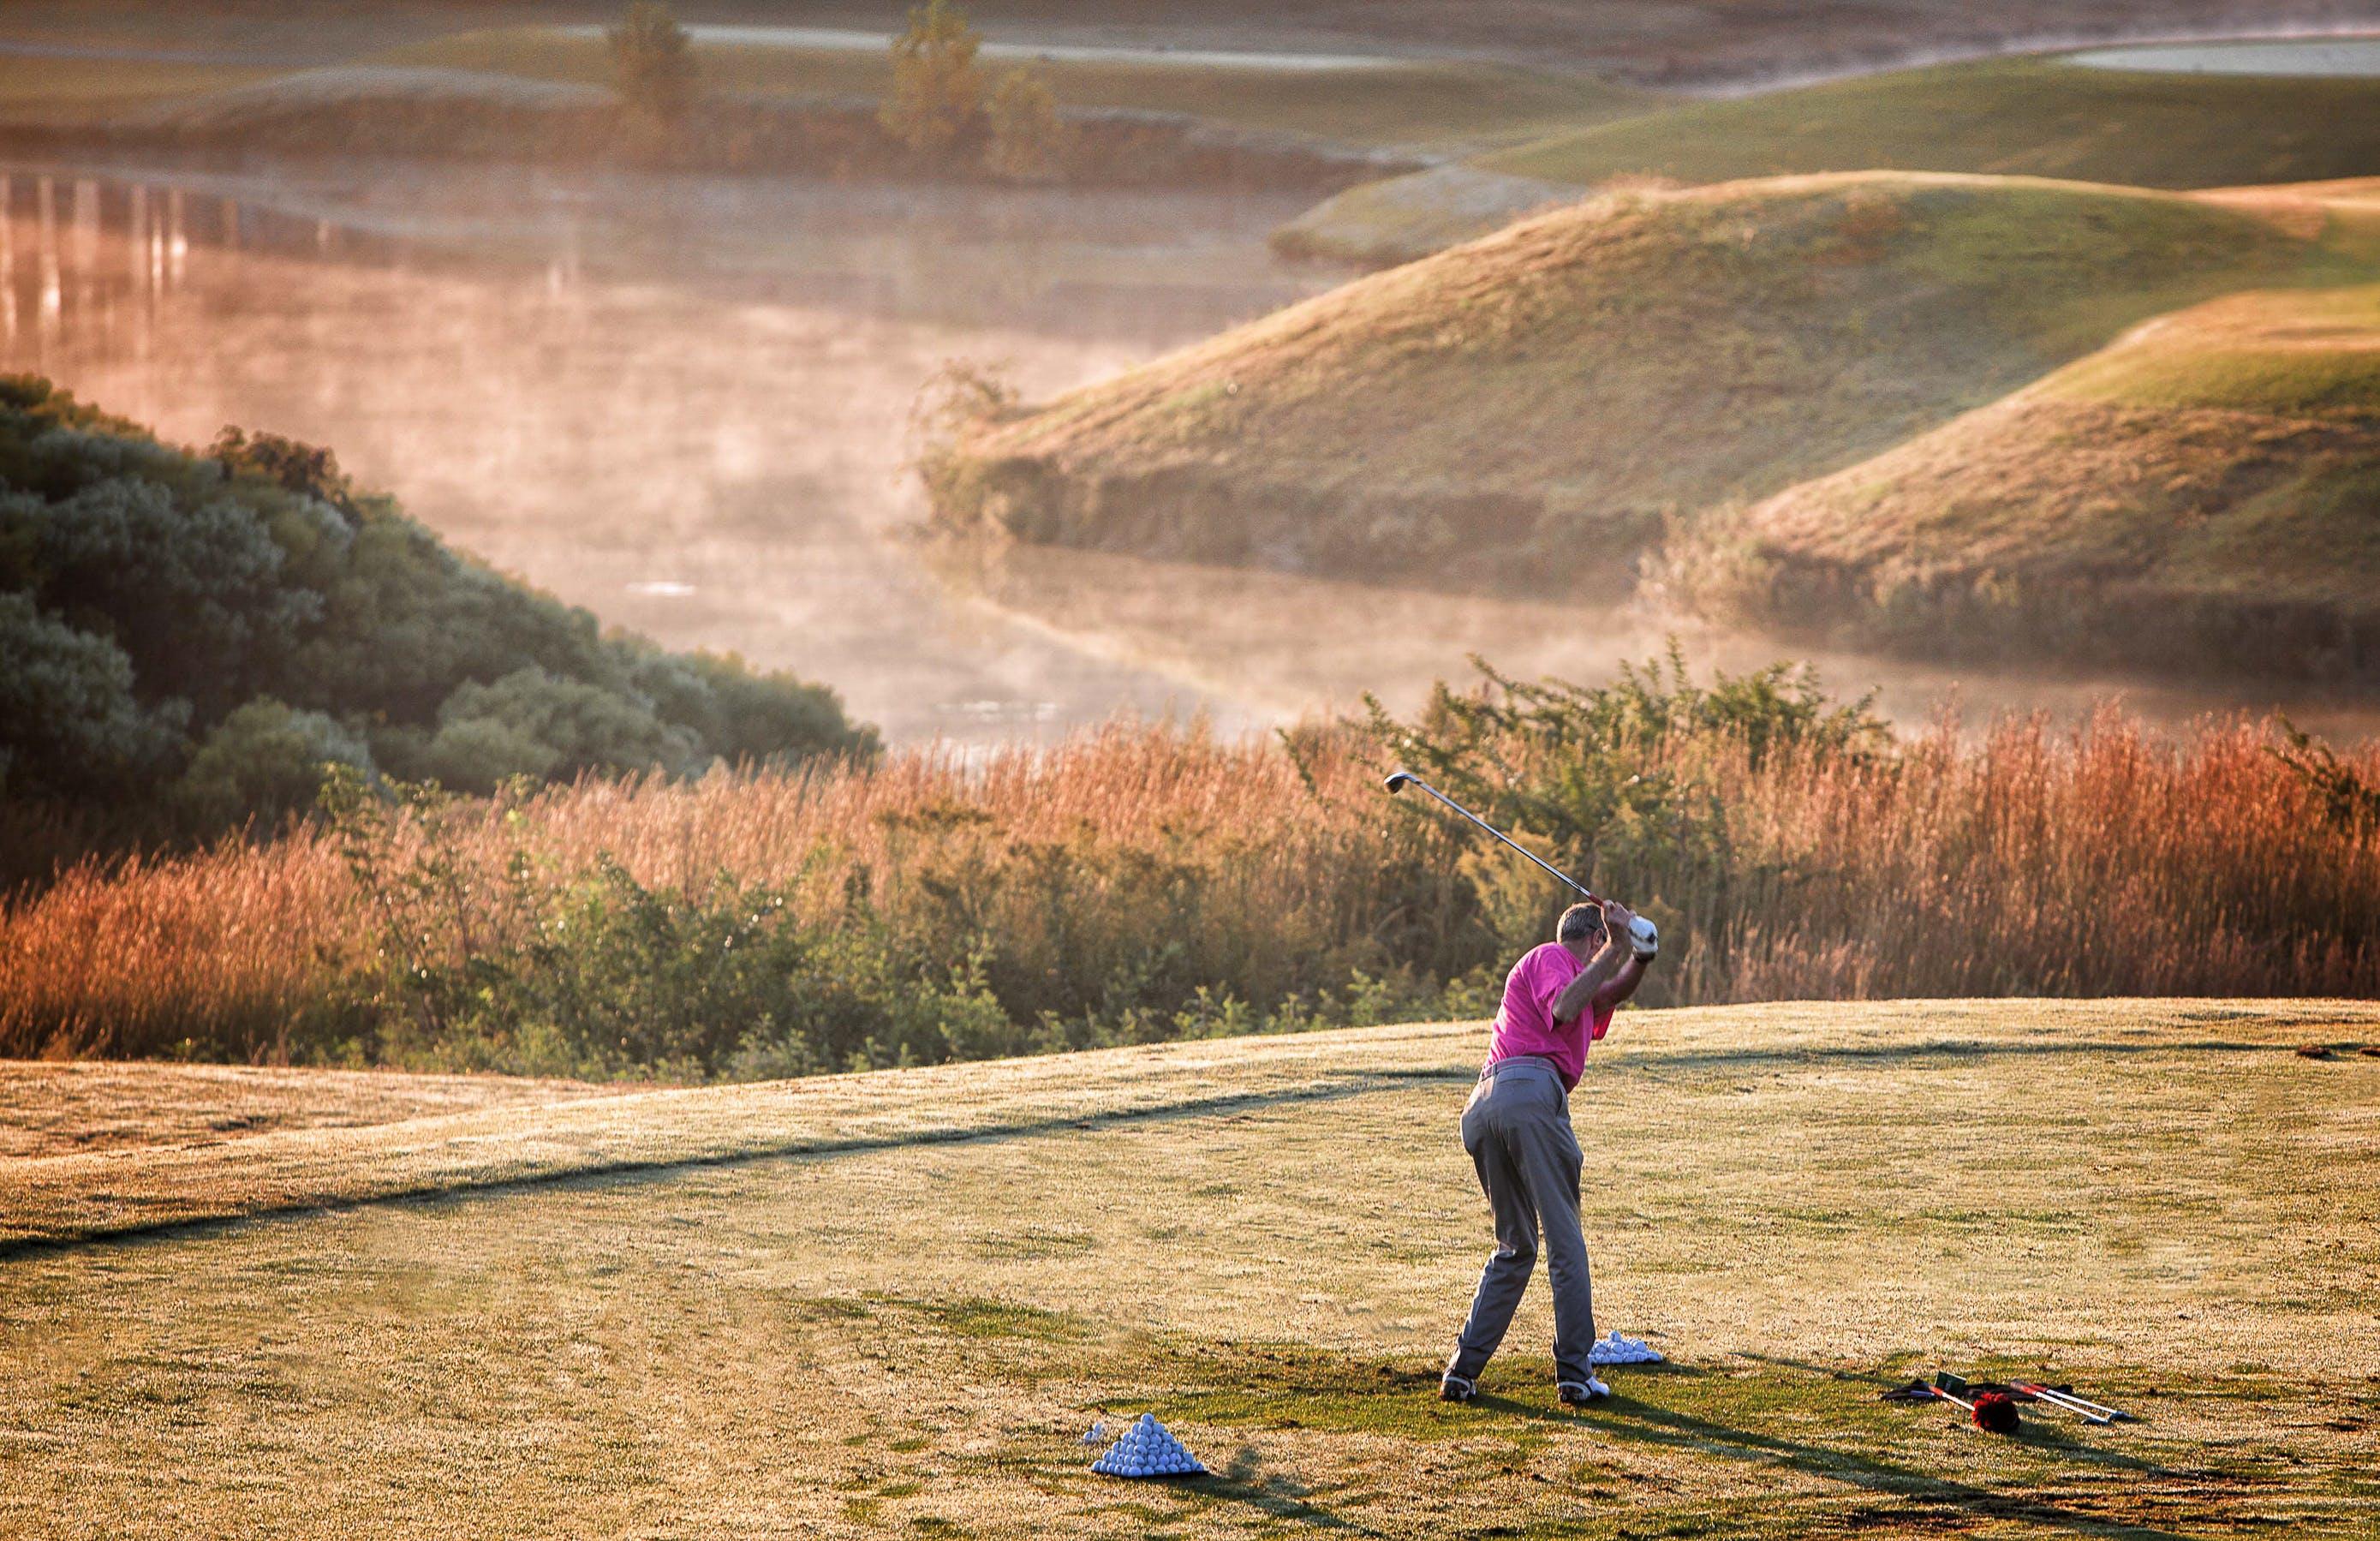 Gratis arkivbilde med dagslys, golf, golf swing, golfkølle